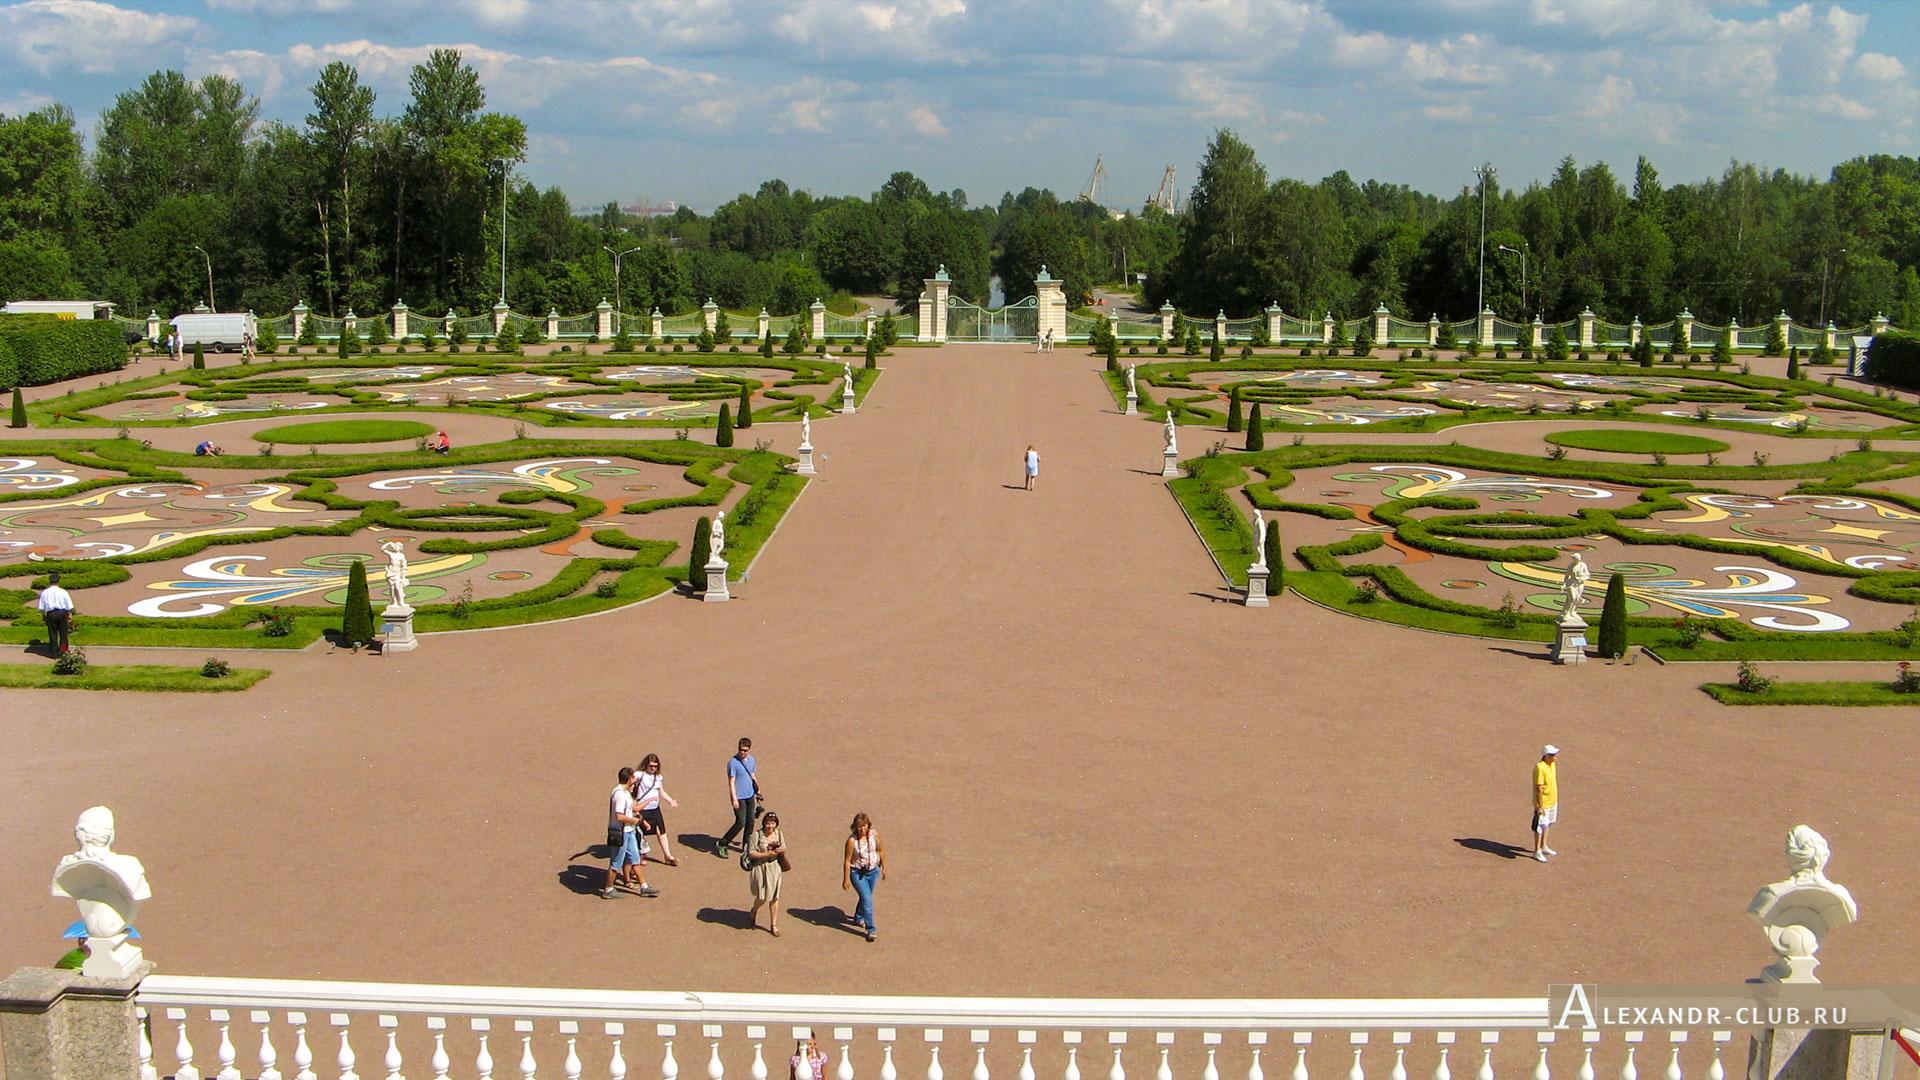 Ораниенбаум, лето, Большой Меншиковский дворец, Нижний сад